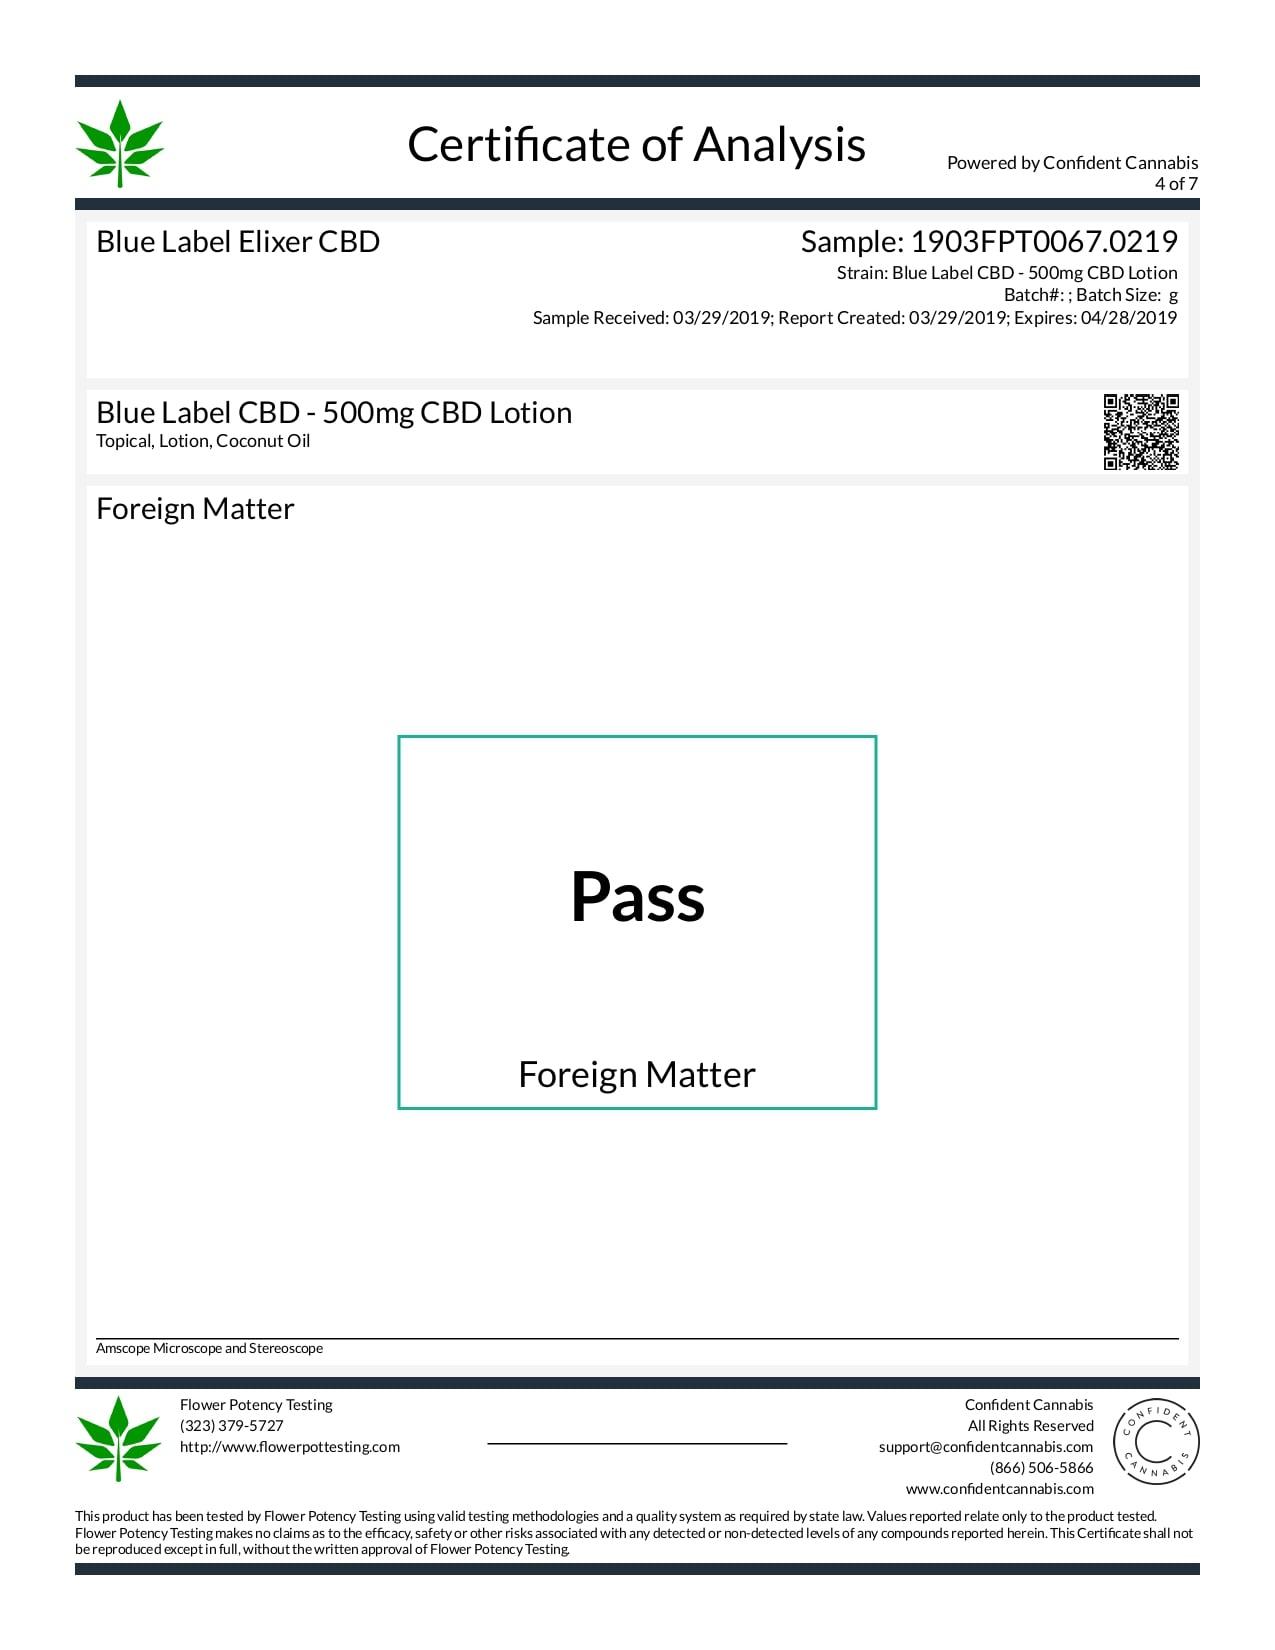 Blue Label CBD Topical Hemp Body Lotion 500mg Lab Report